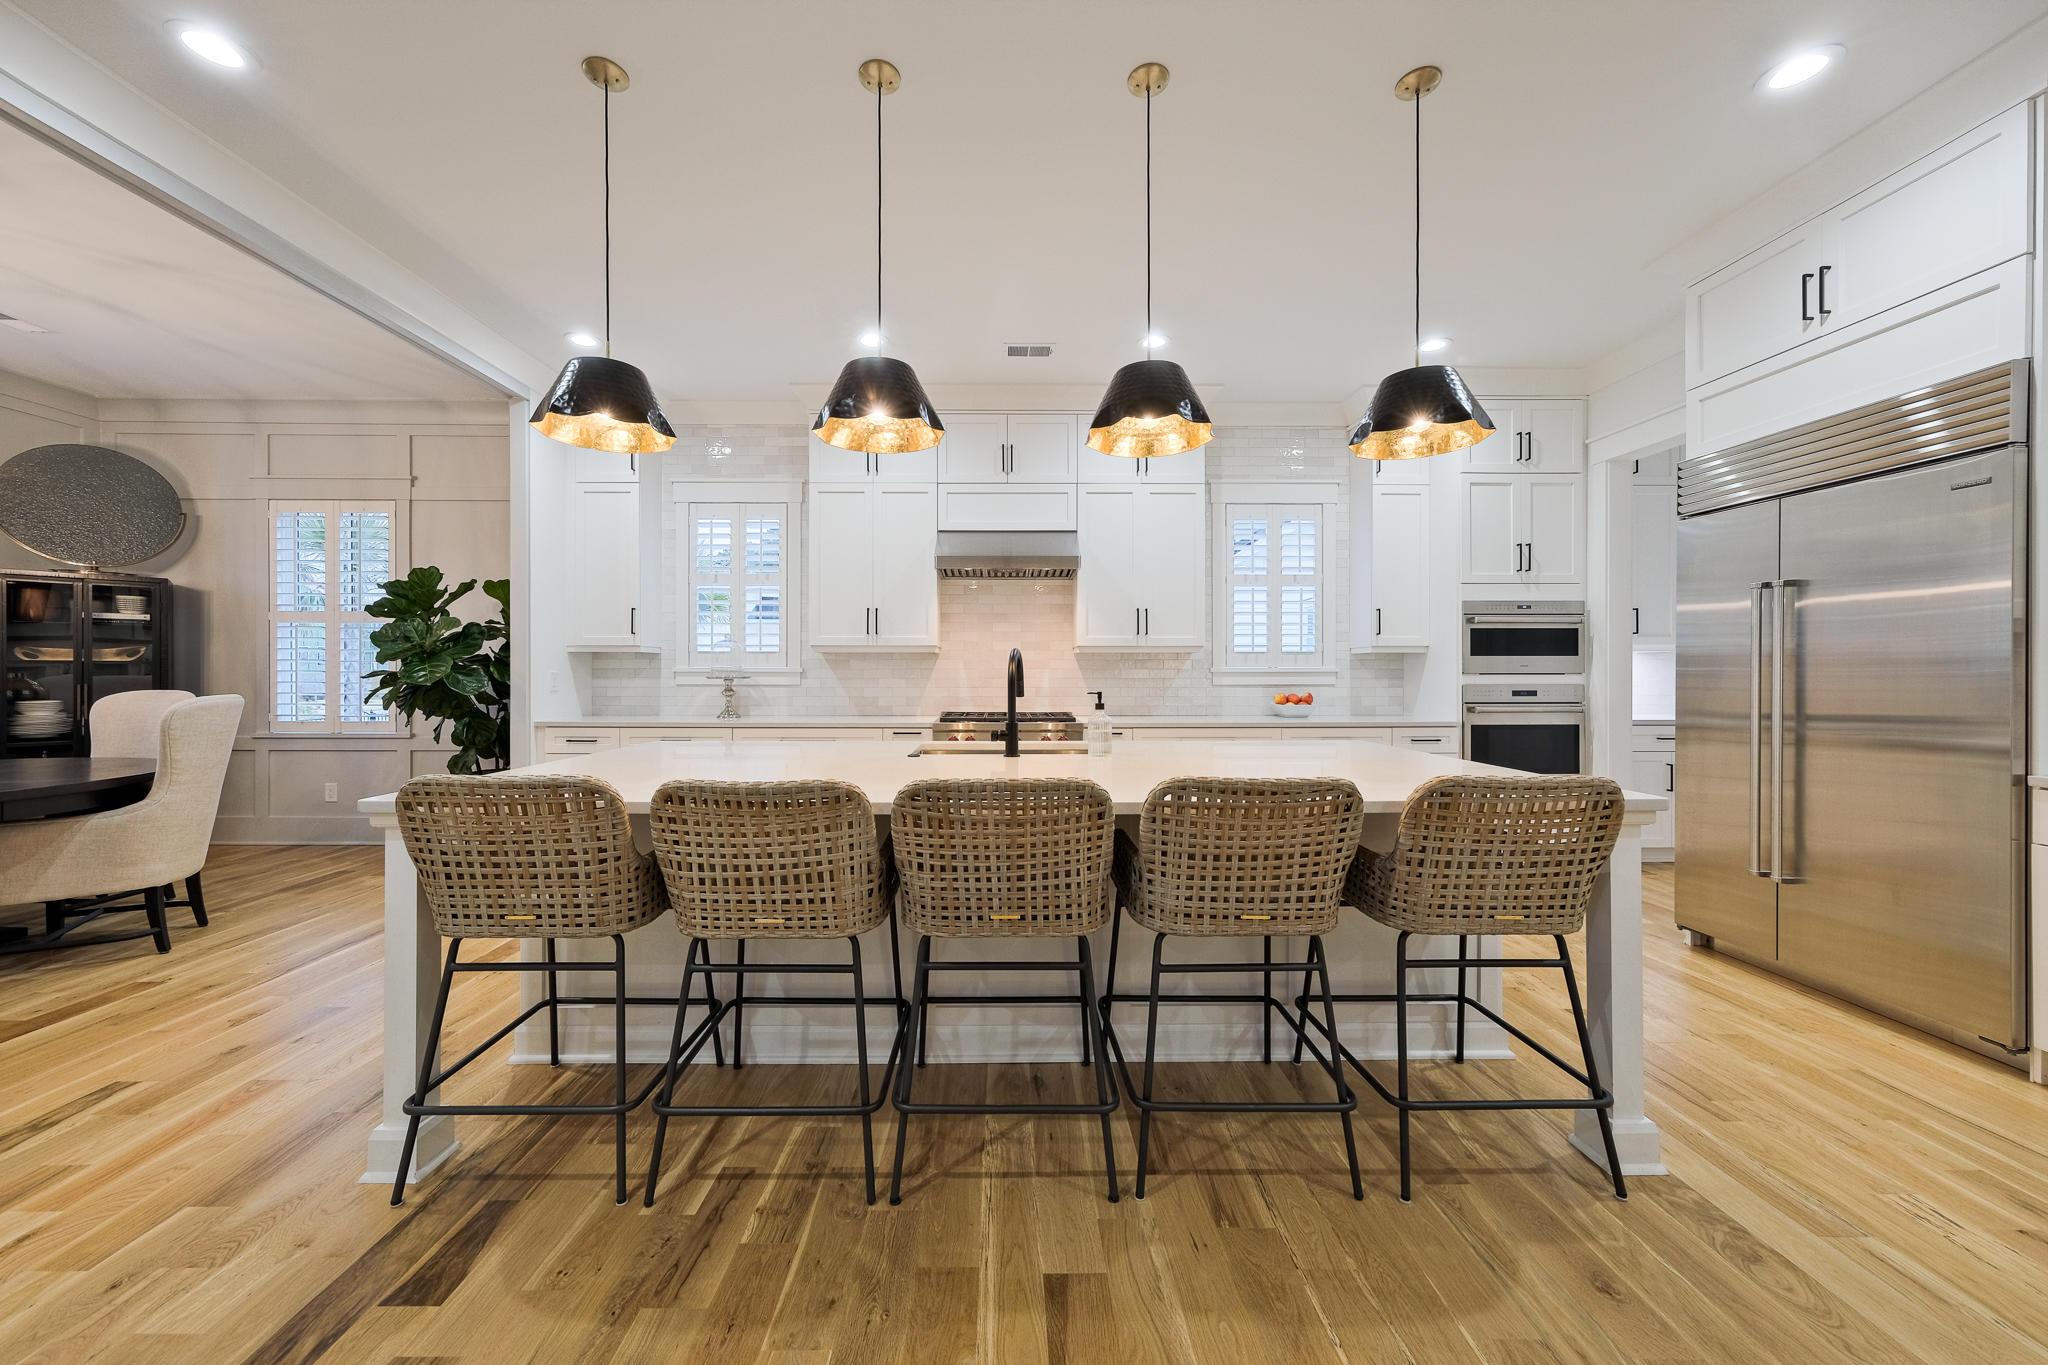 Daniel Island Park Homes For Sale - 208 Brailsford, Charleston, SC - 28